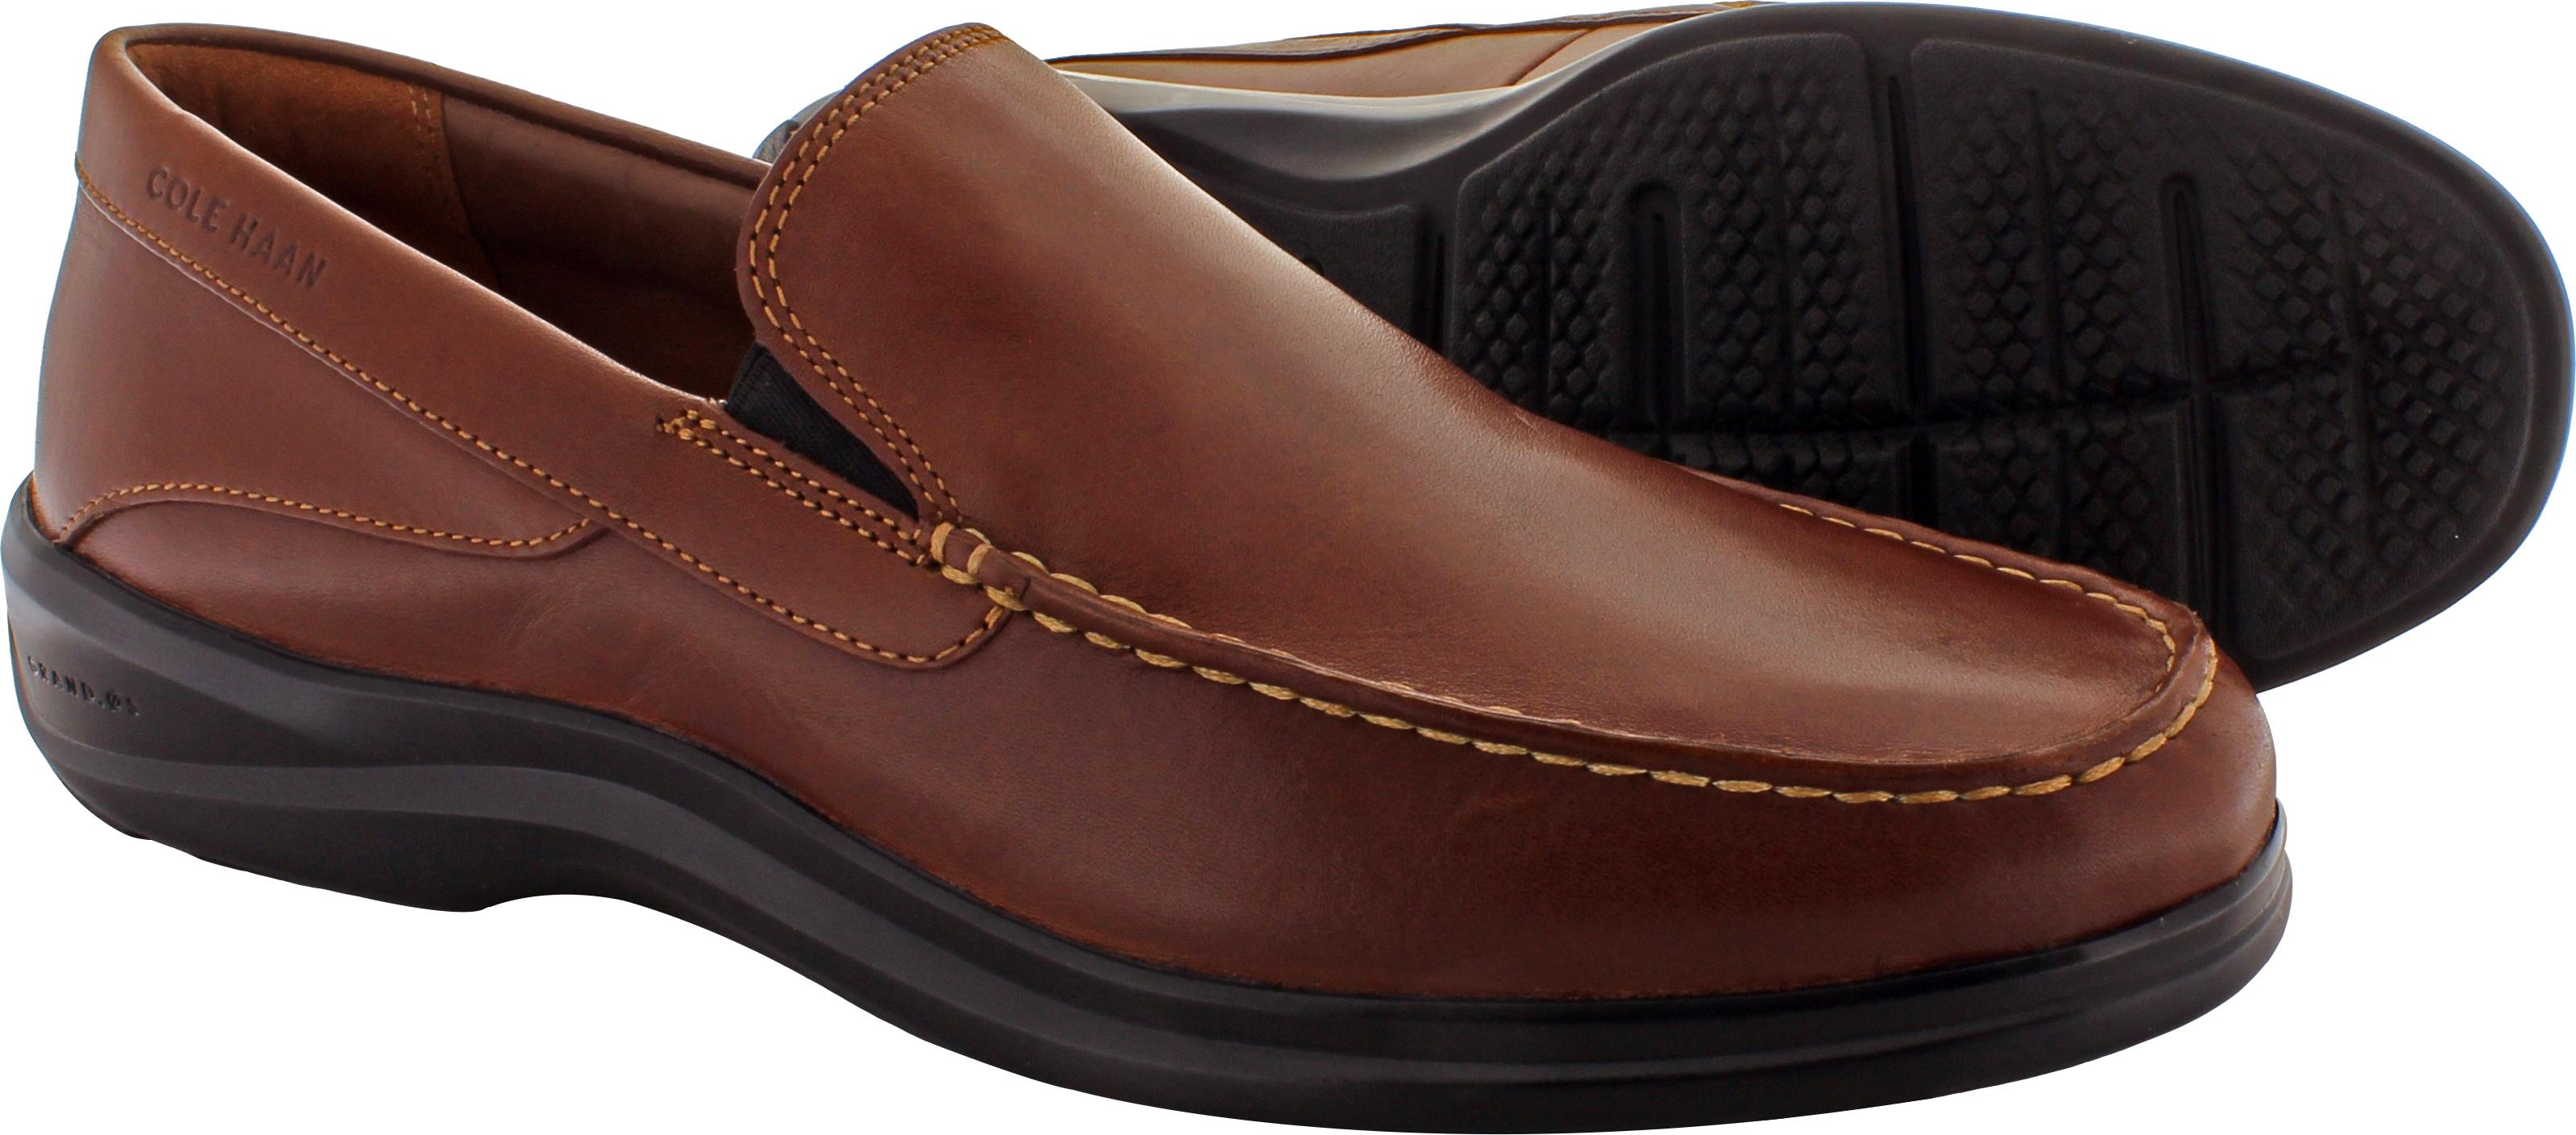 5c116ec0239 Cole Haan Men s C25936 - Santa Barbara Twin Gore Ii - The Shoe Mart